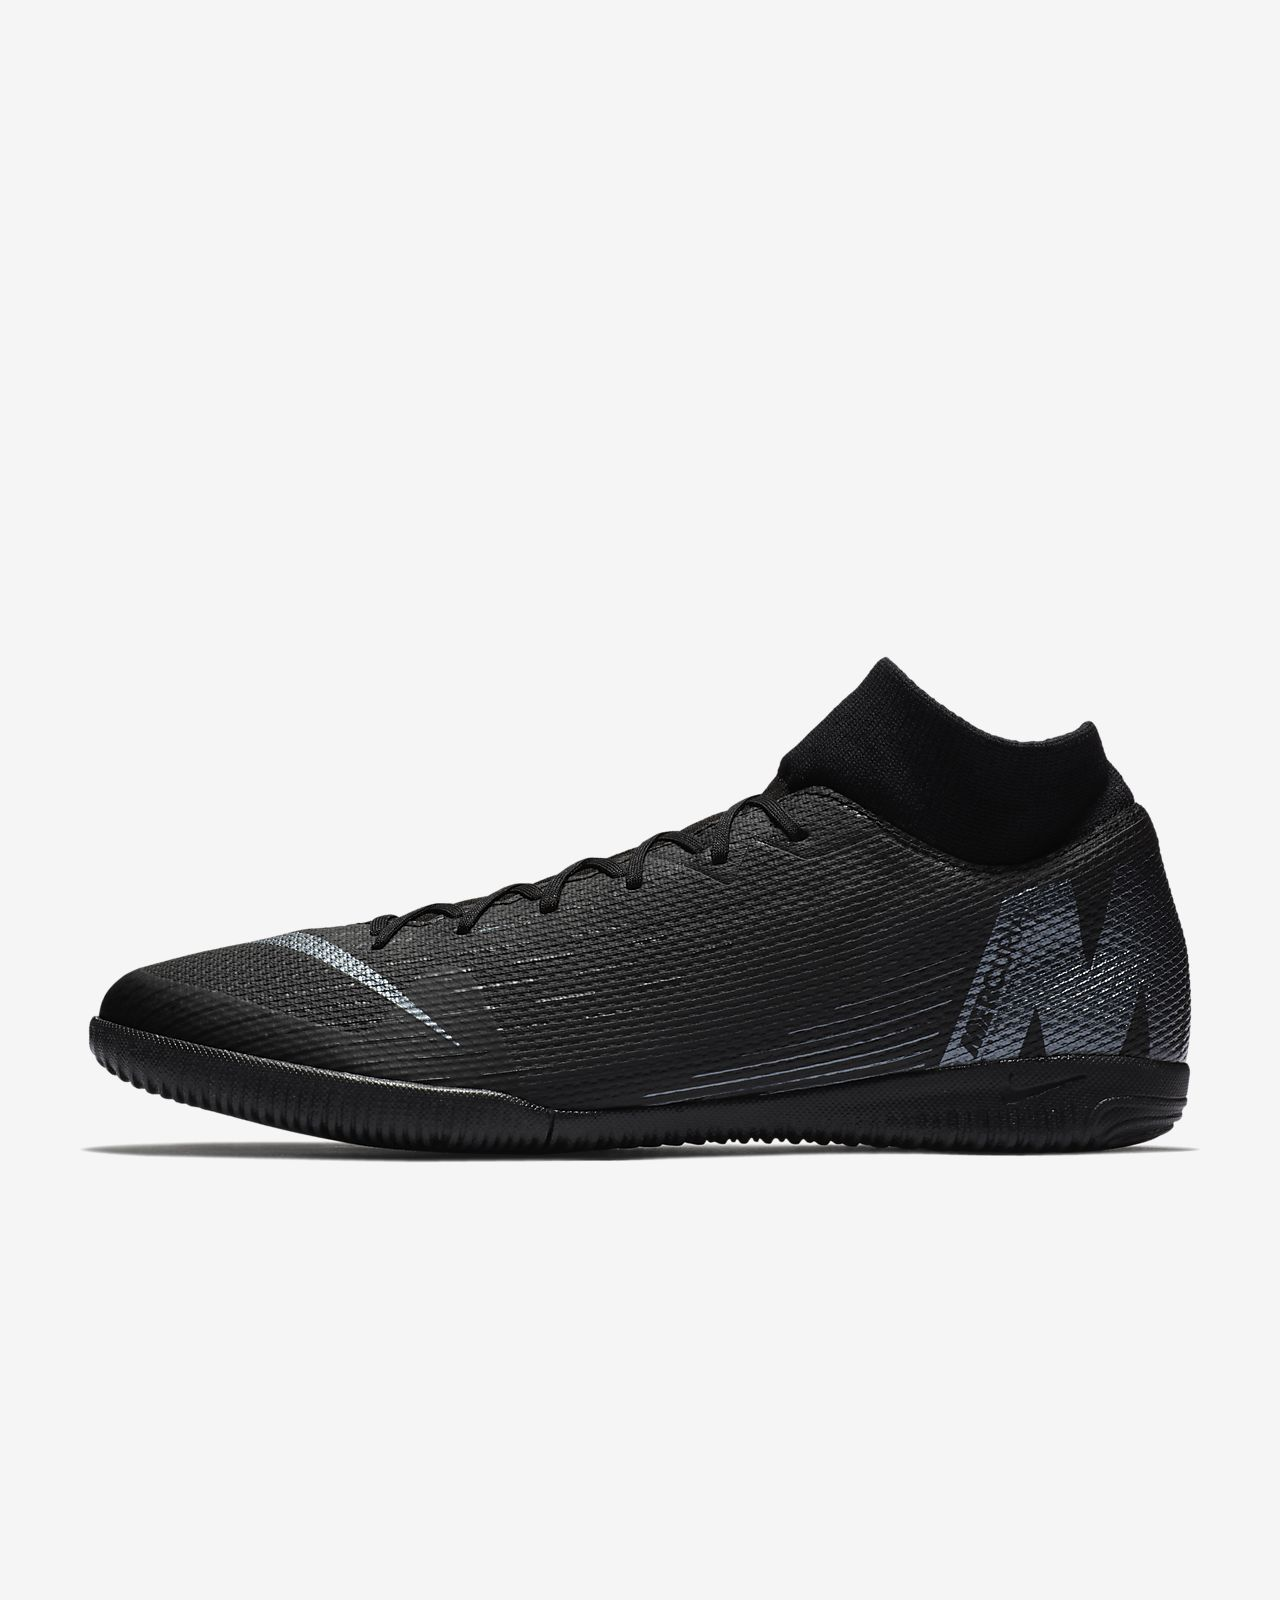 b8066ef12c899 order nike mercurialx superfly vi academy ic indoor court football shoe  c03e0 76d7d